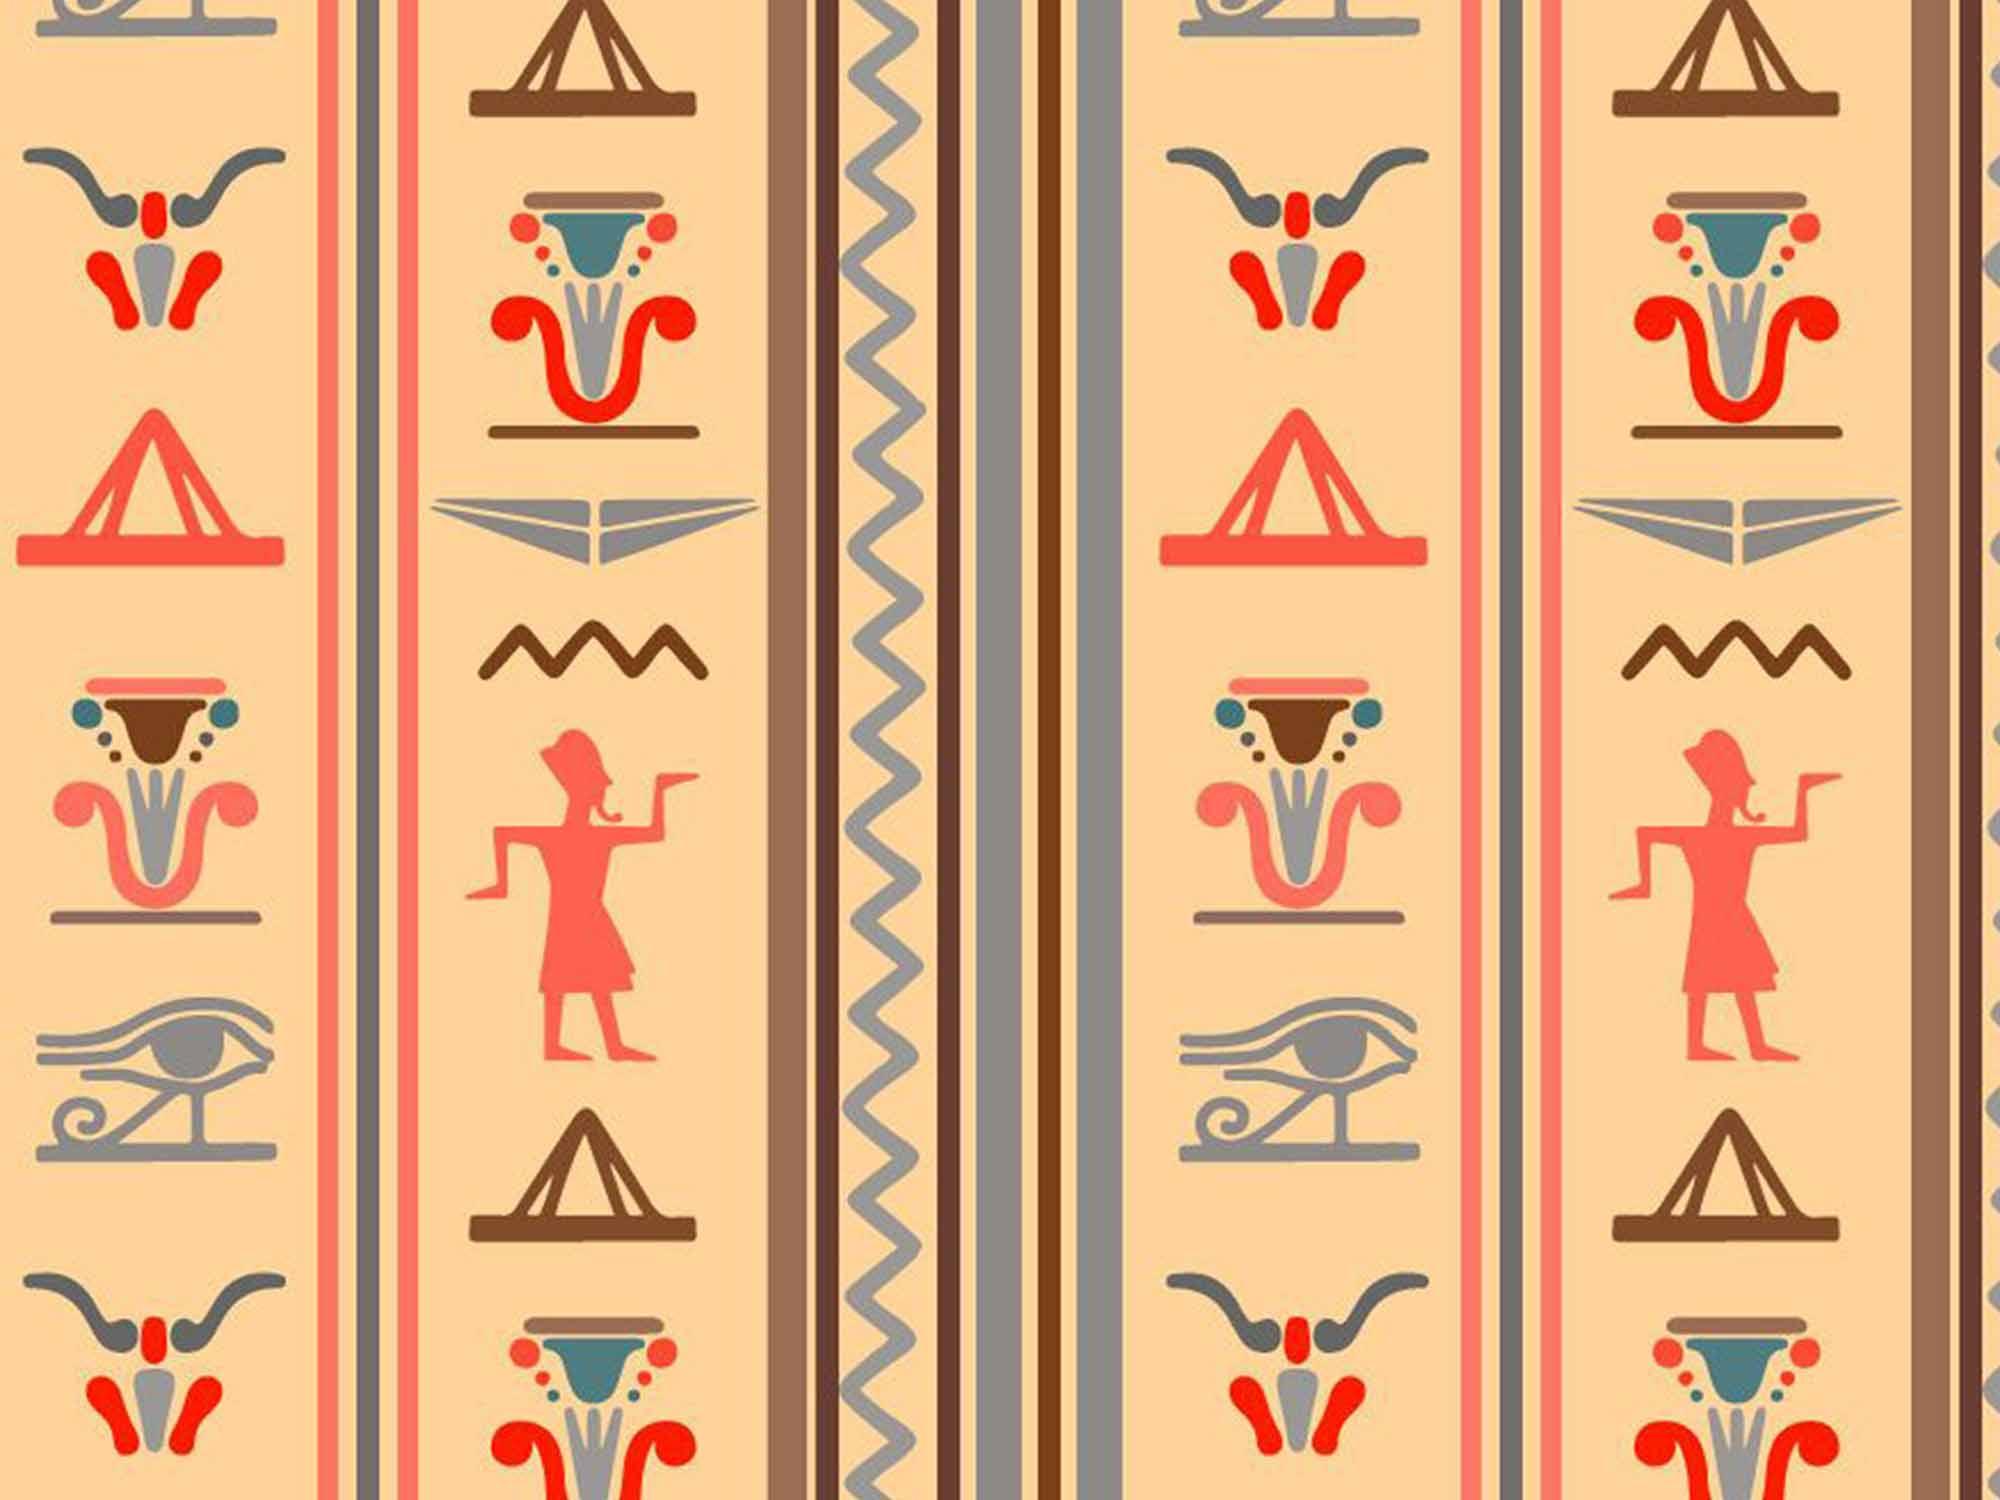 Papel de Parede Indiano 0014 - Adesivos de Parede  - Paredes Decoradas